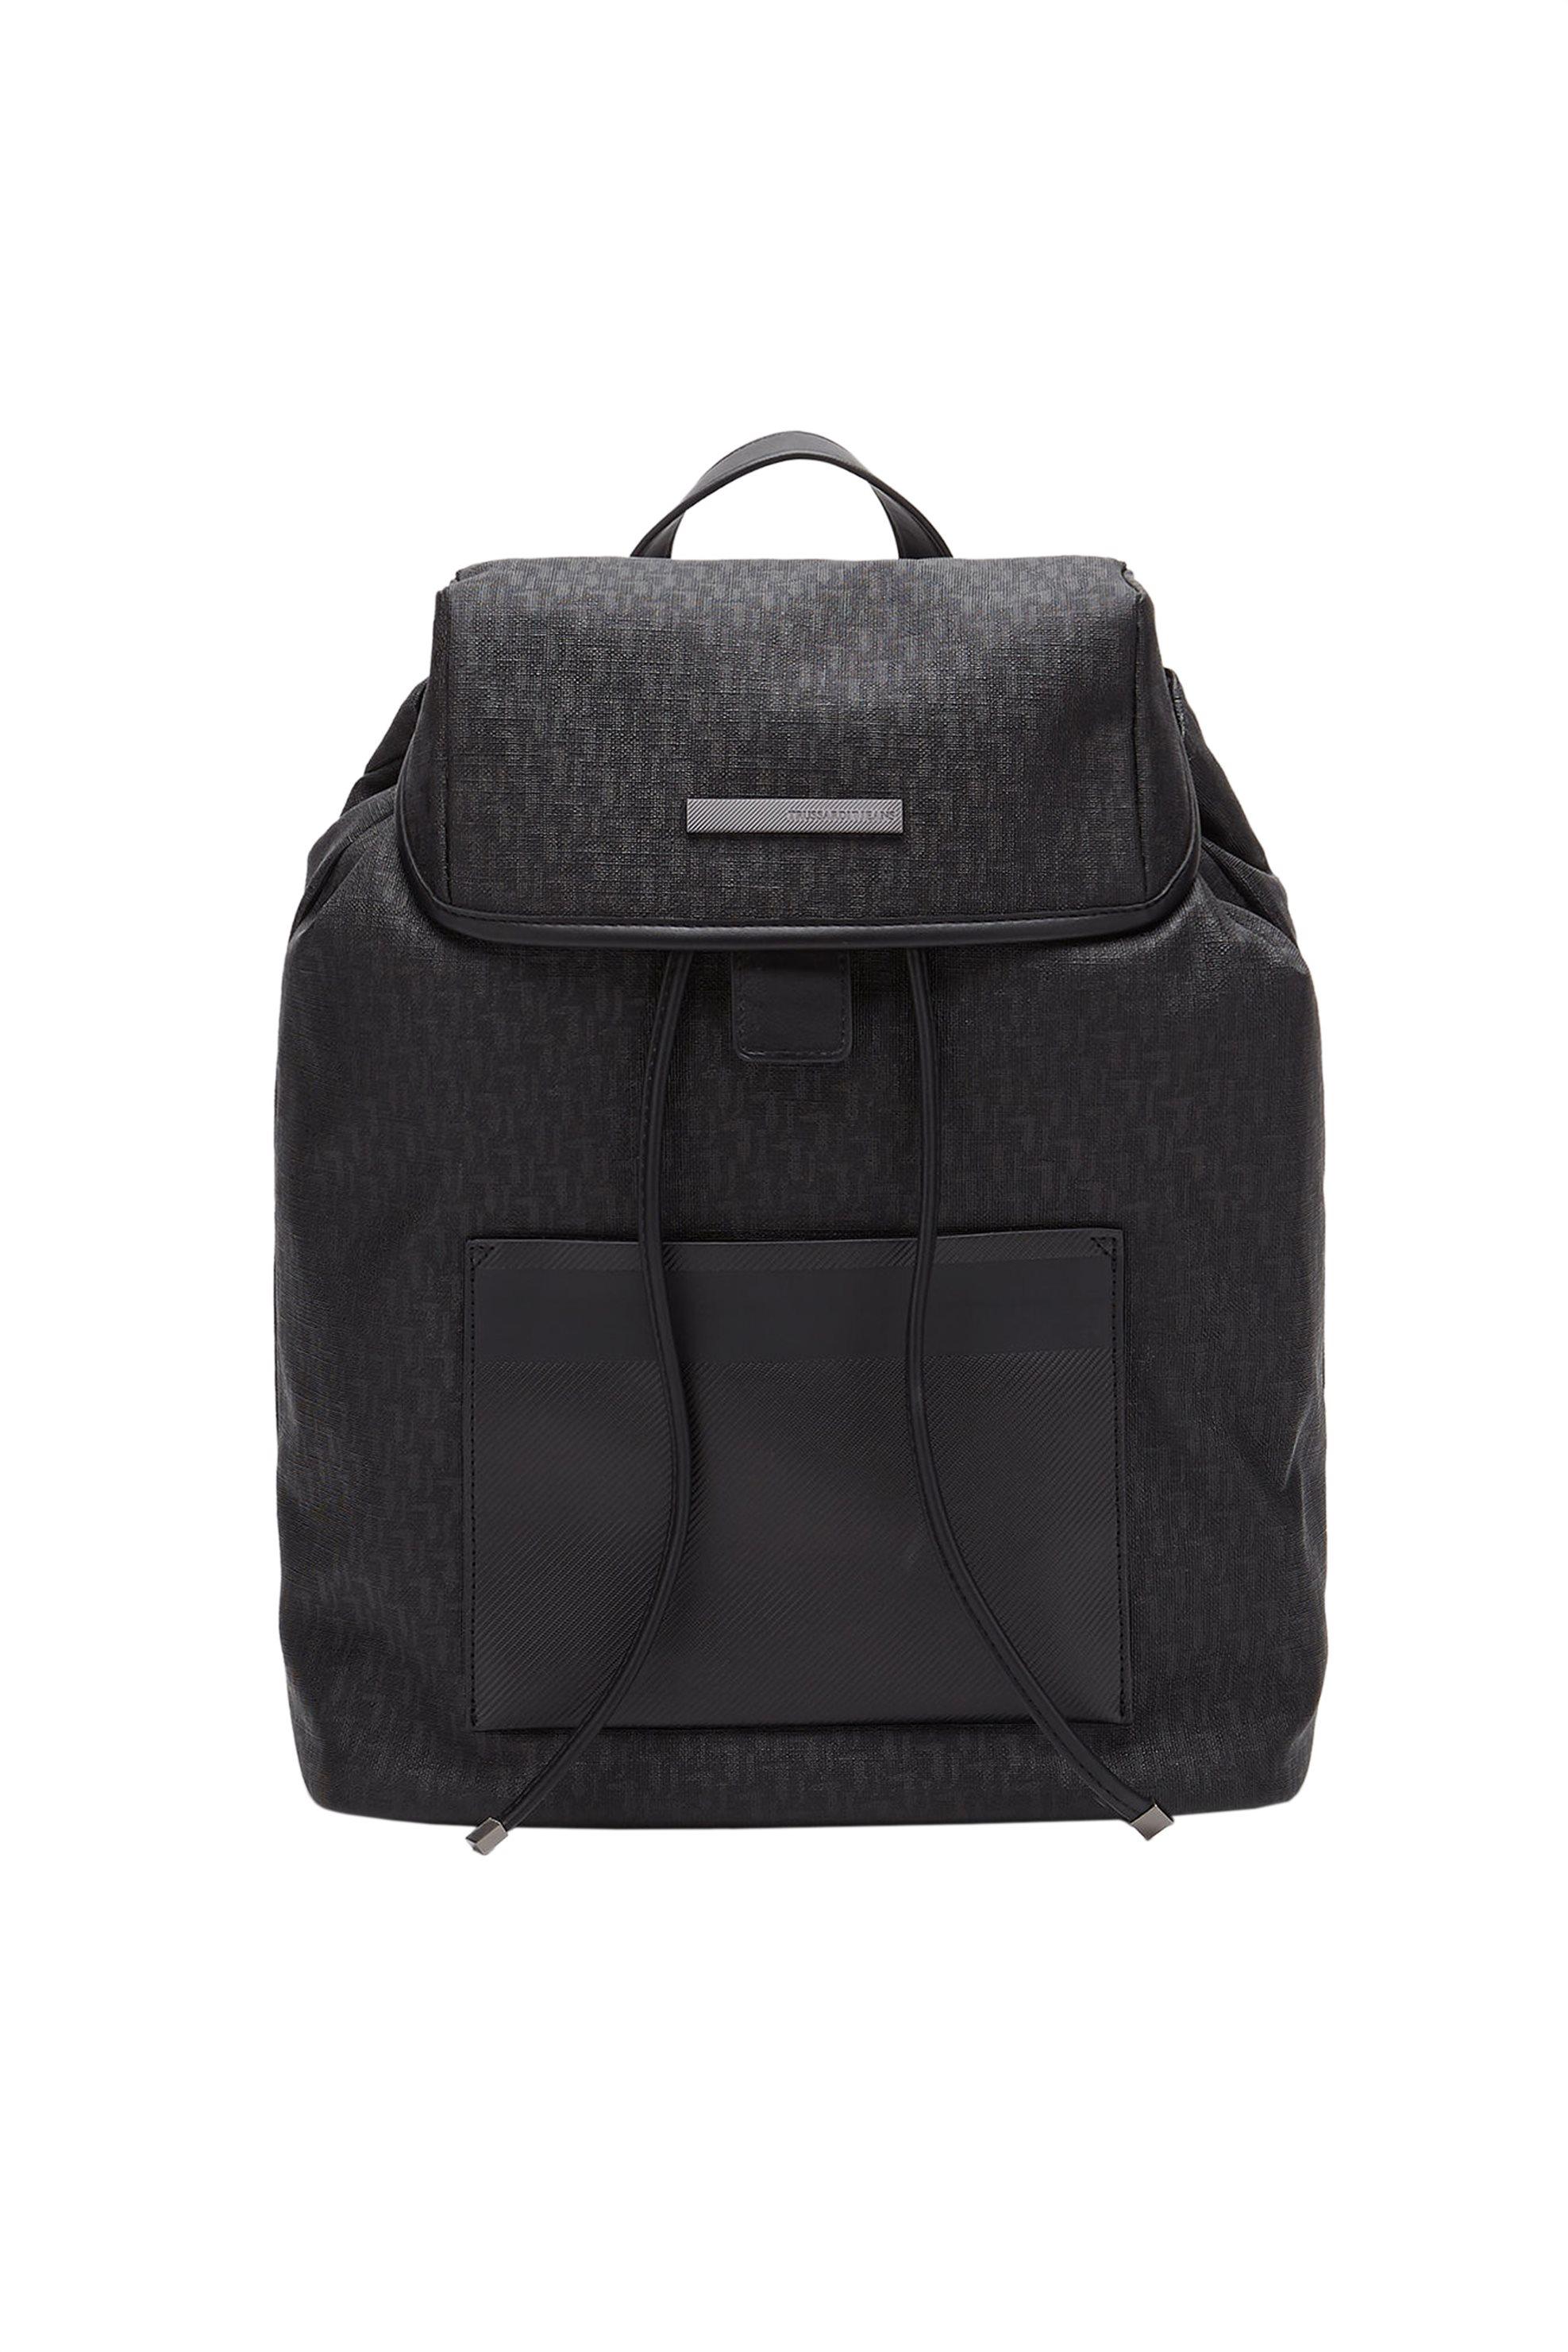 Trussardi Jeans ανδρικό backpack Branded Bocconi - 71B00077-9Y099999 - Μαύρο ανδρασ   τσαντεσ   σακίδια   backpacks